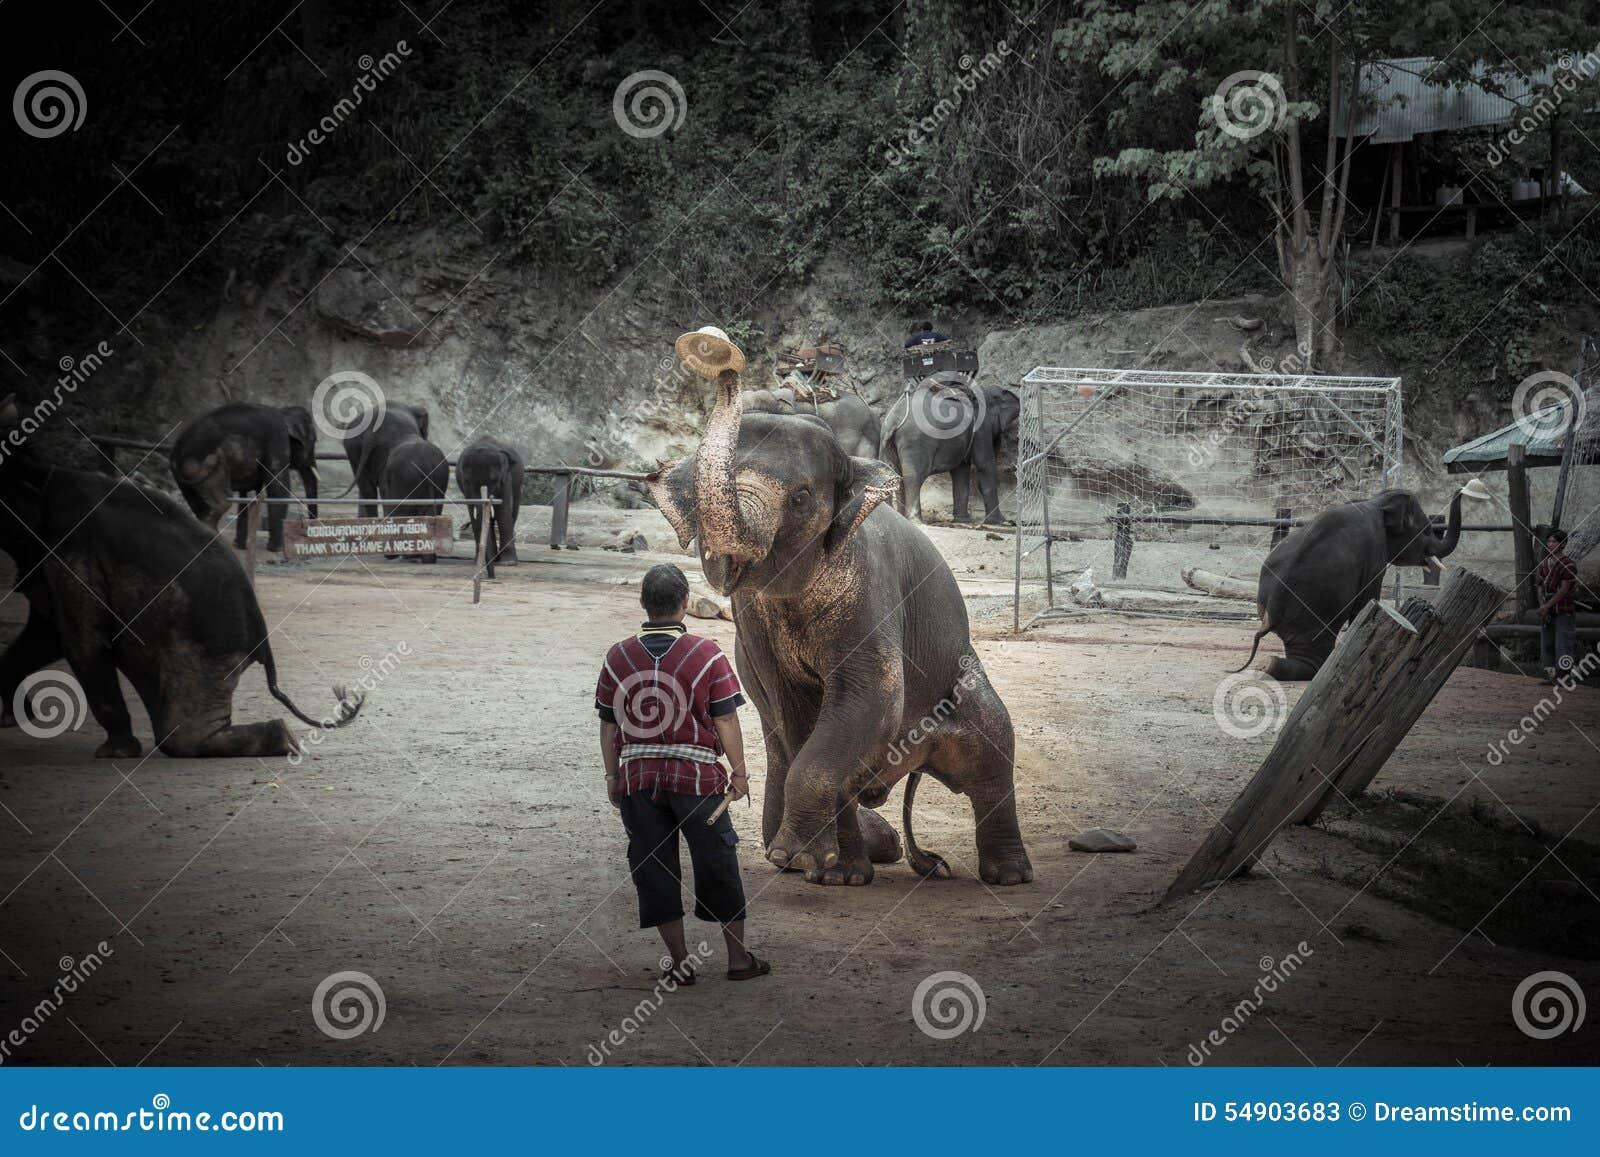 Bathing elephants at Mae Sa Elephant Camp, Mae Rim, Chiang Mai.